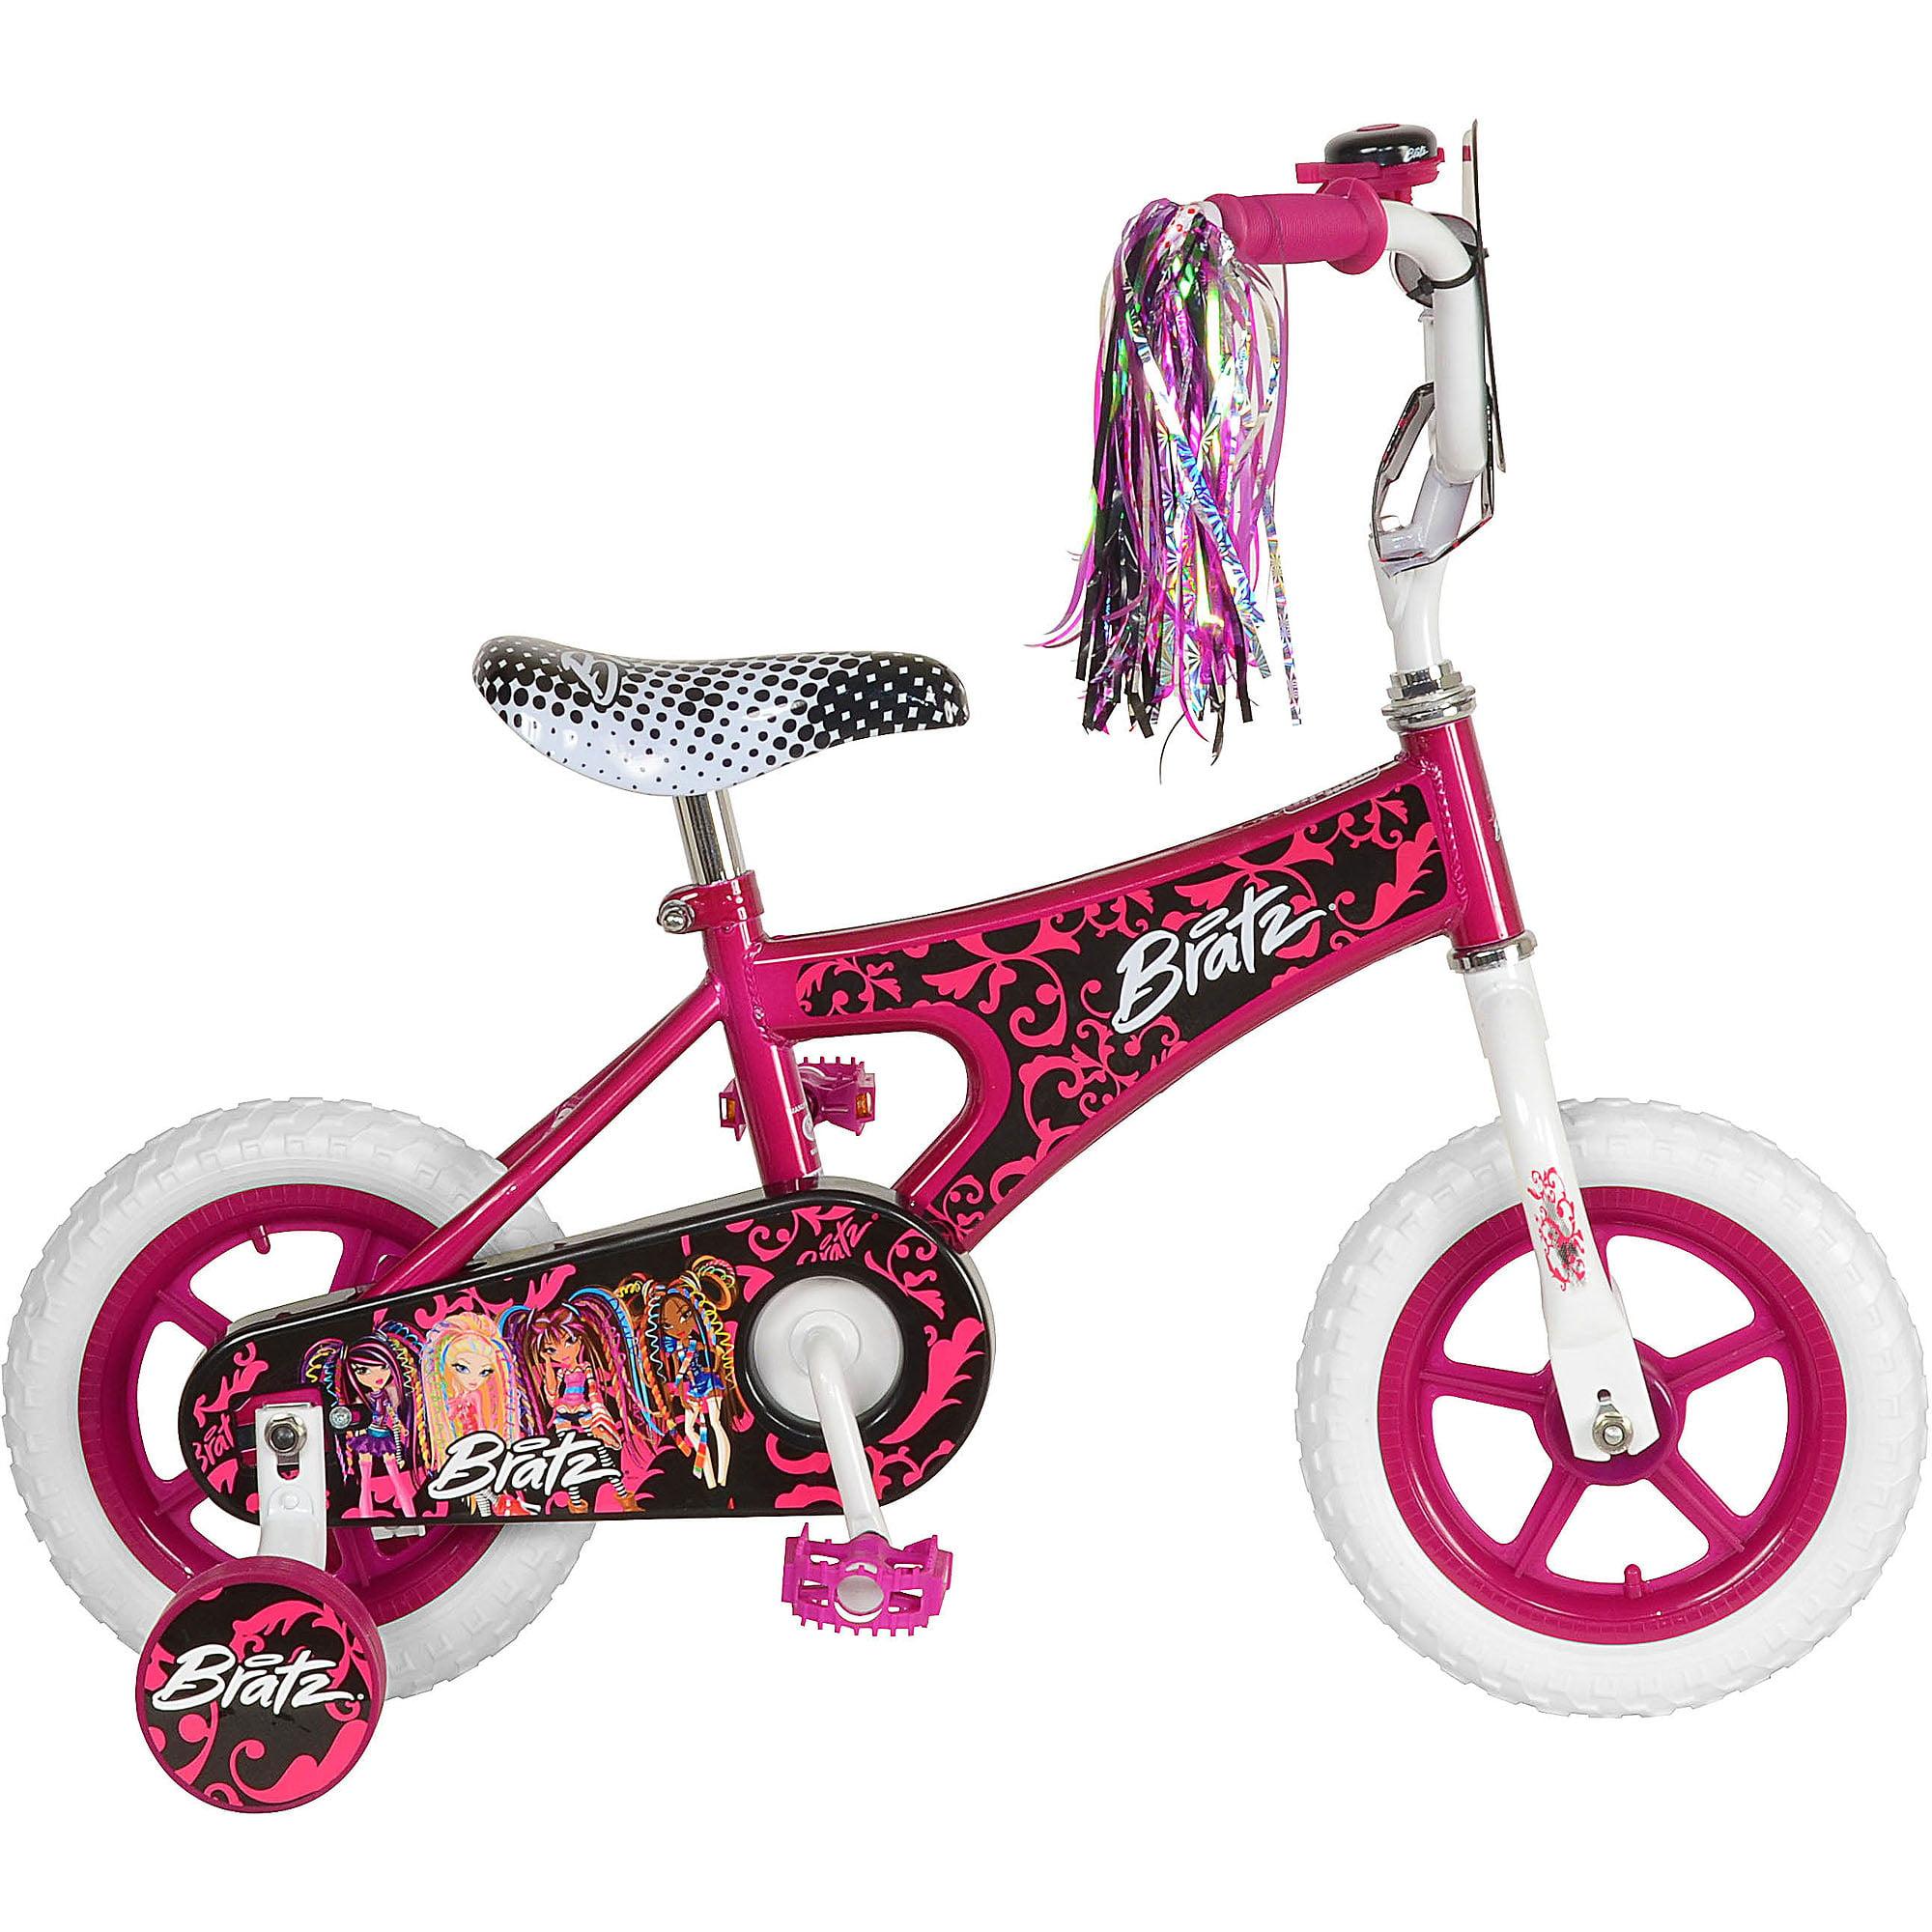 "Bratz 12"" Pink Bike by Generic"